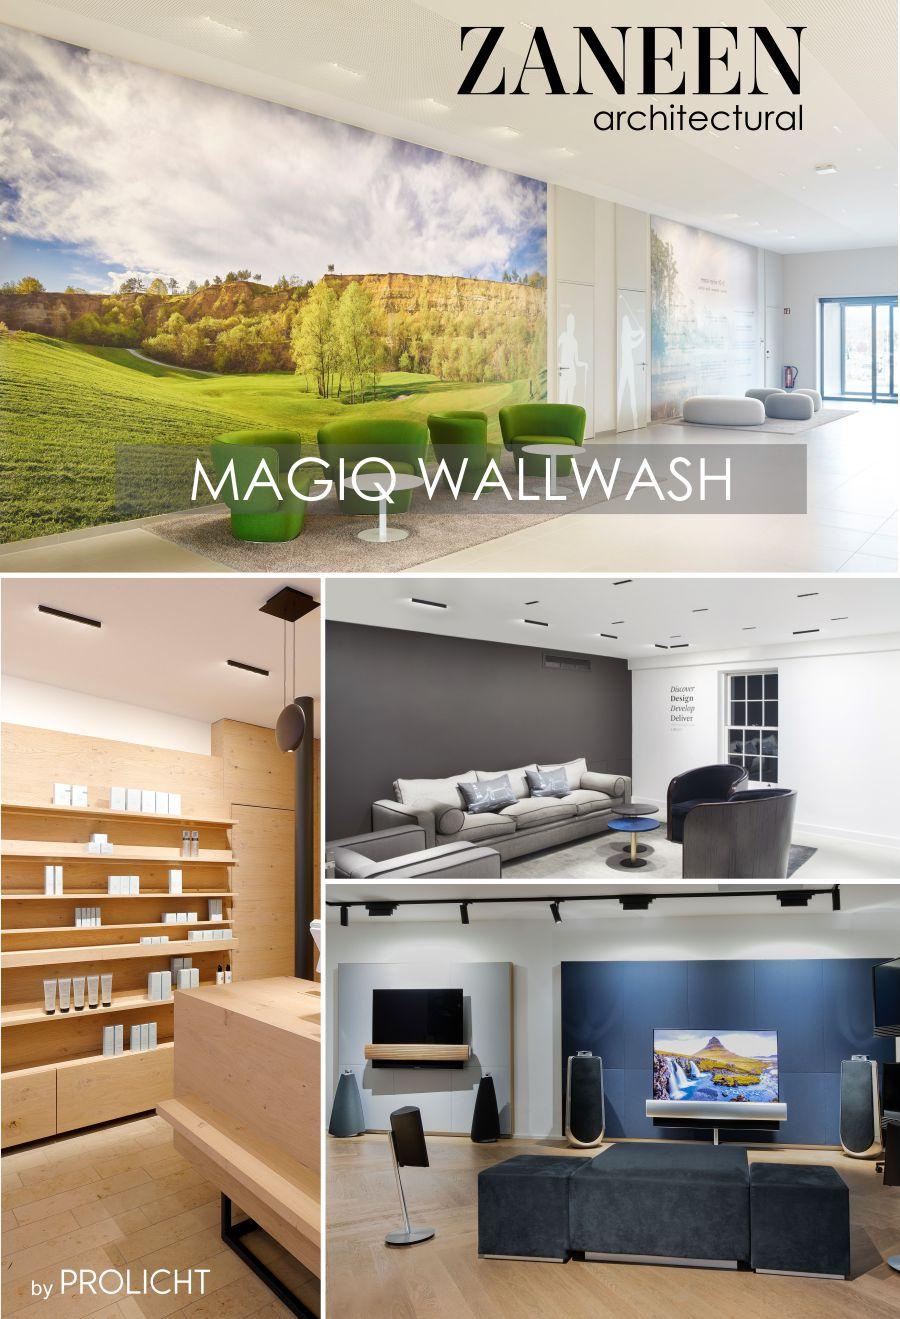 December 10, 2019 MAGIQ Wallwash